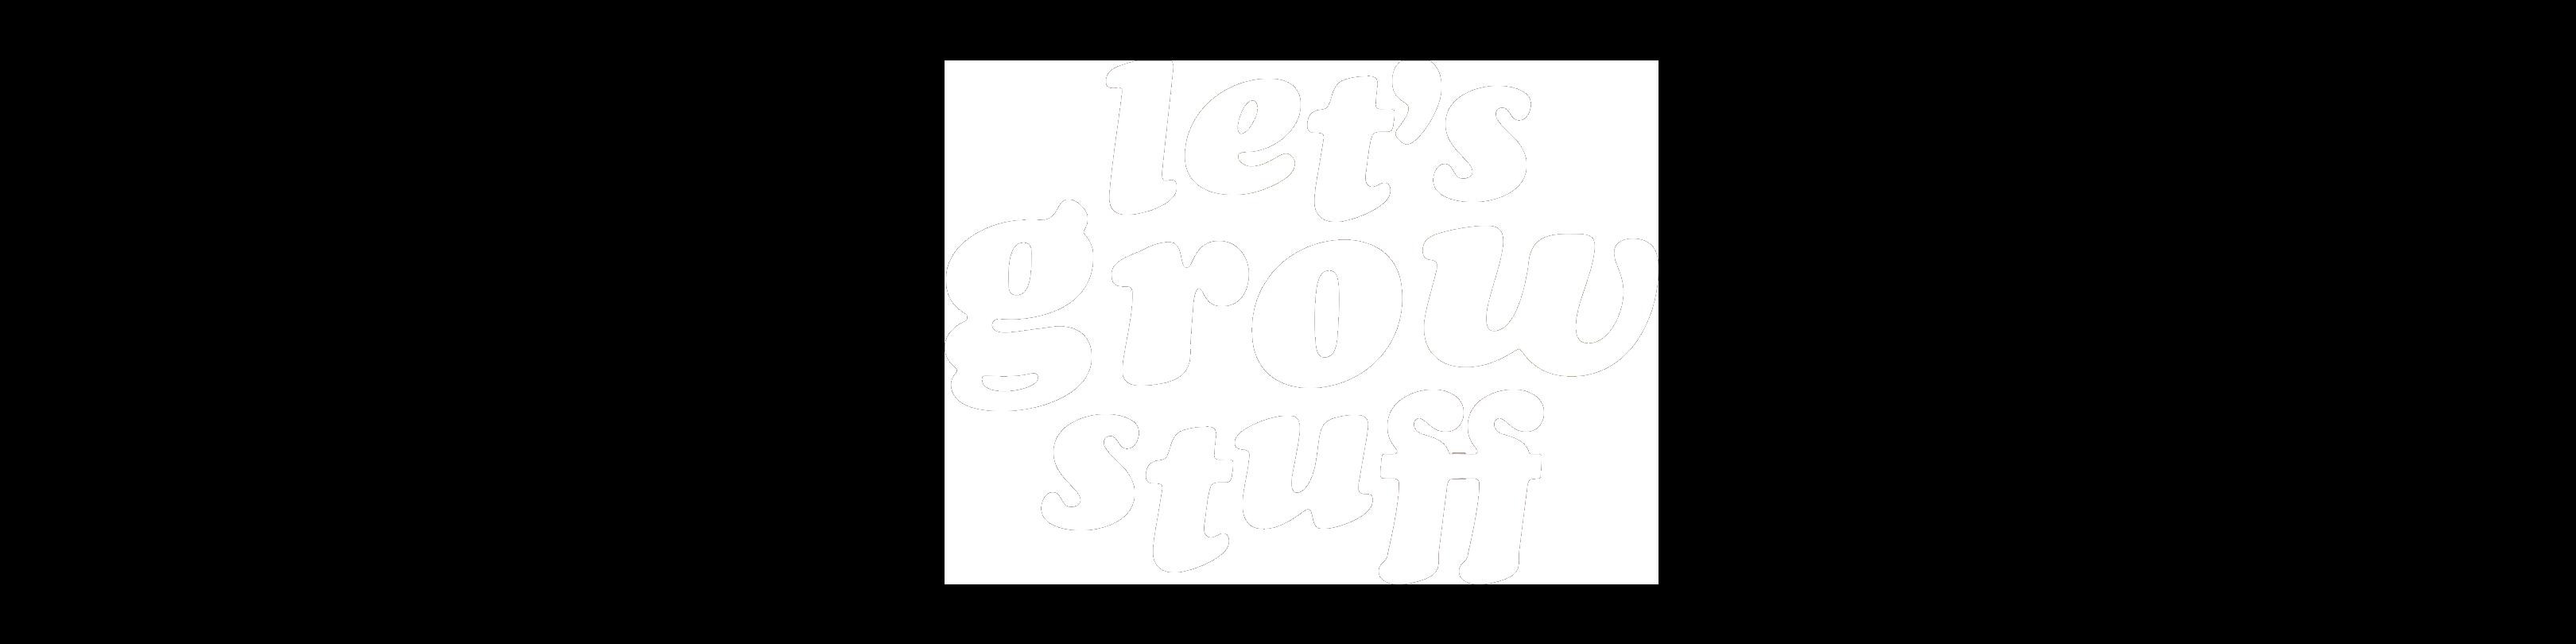 Let's Grow Stuff